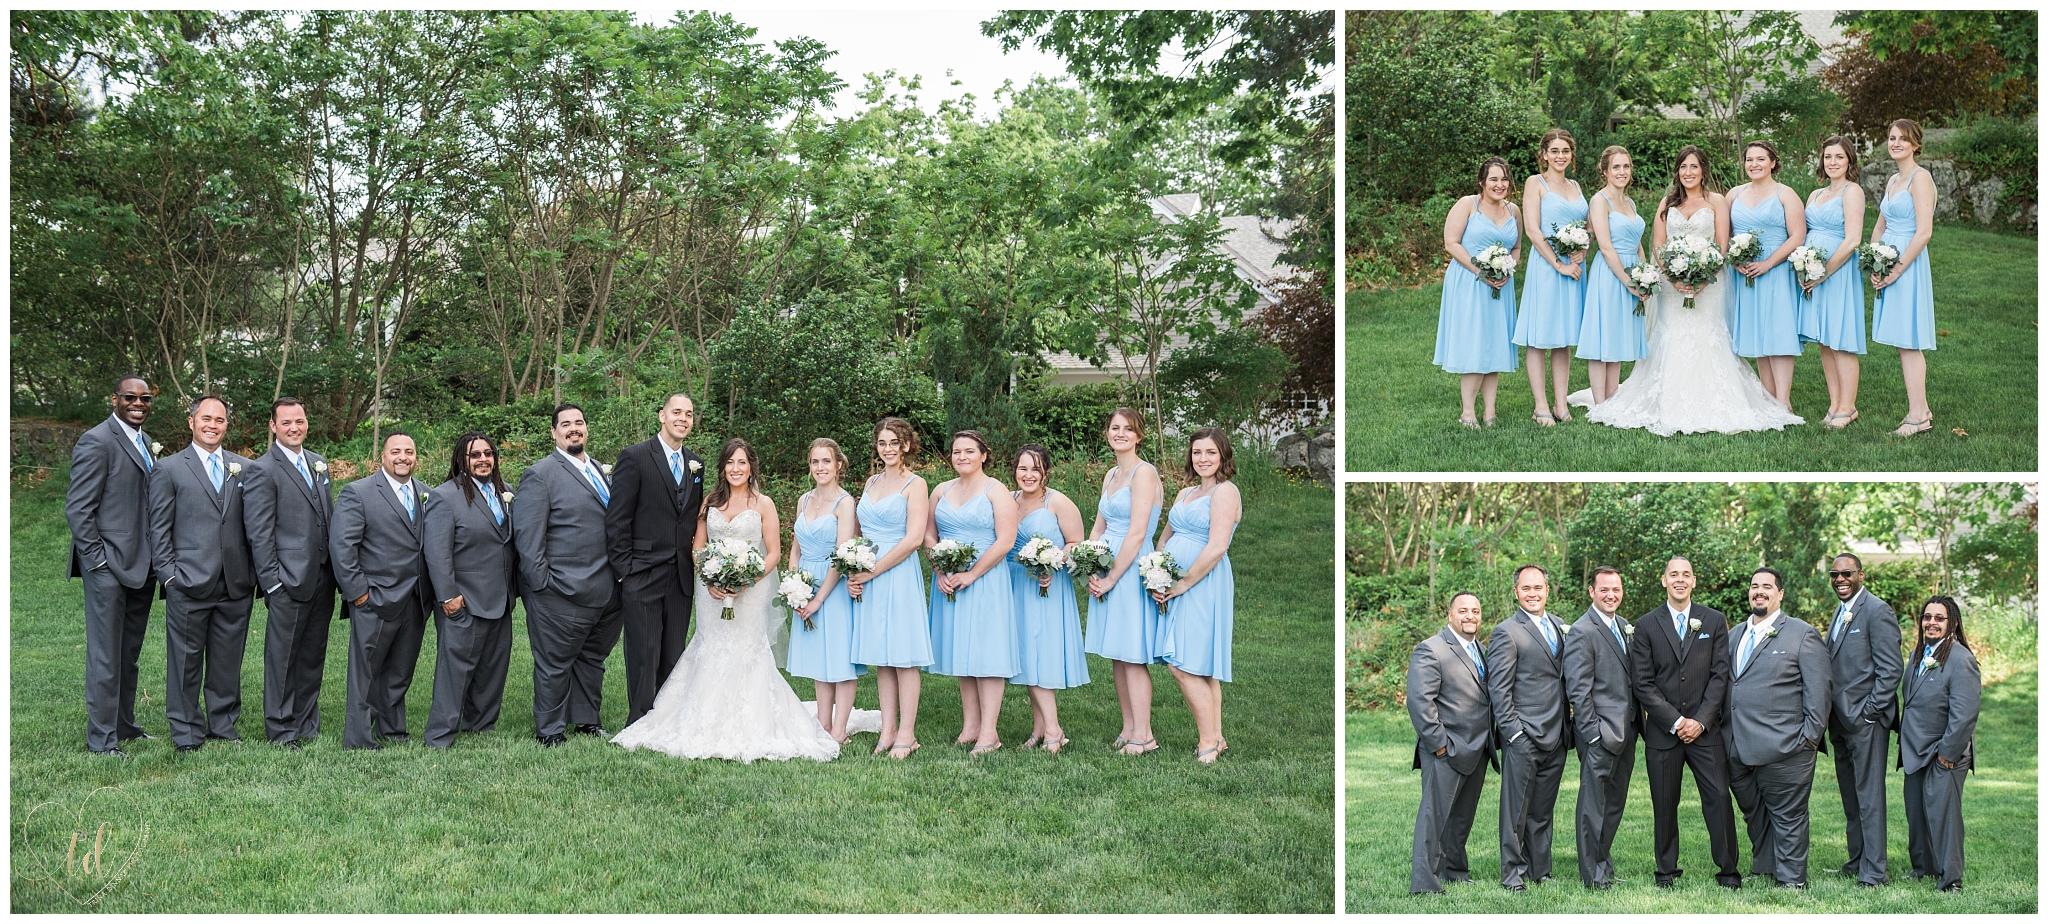 New Hampshire Wedding Party Portrait Photography